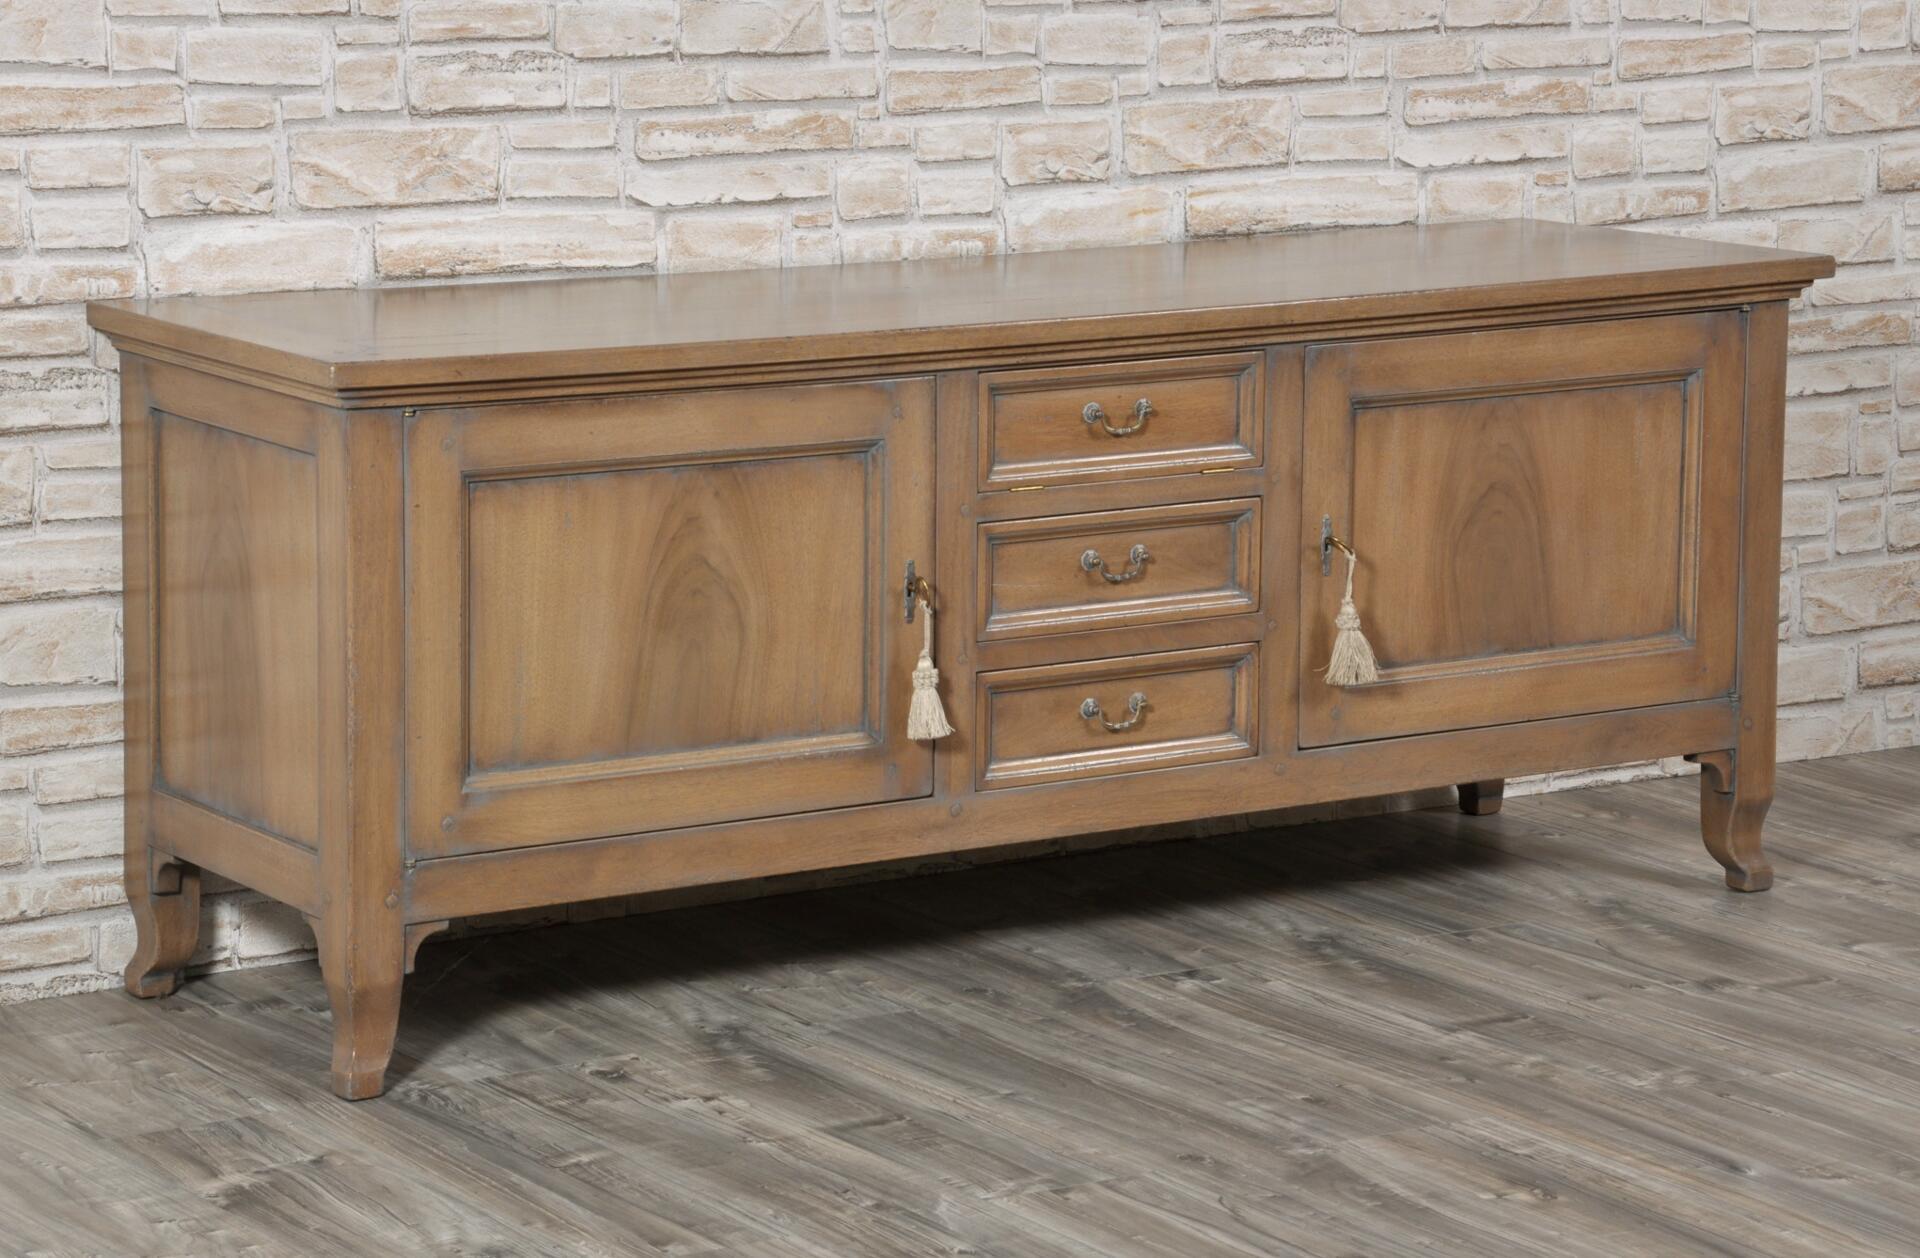 Porta tv cassapanca di lusso costruita in stile classico - Cassapanca in legno ikea ...